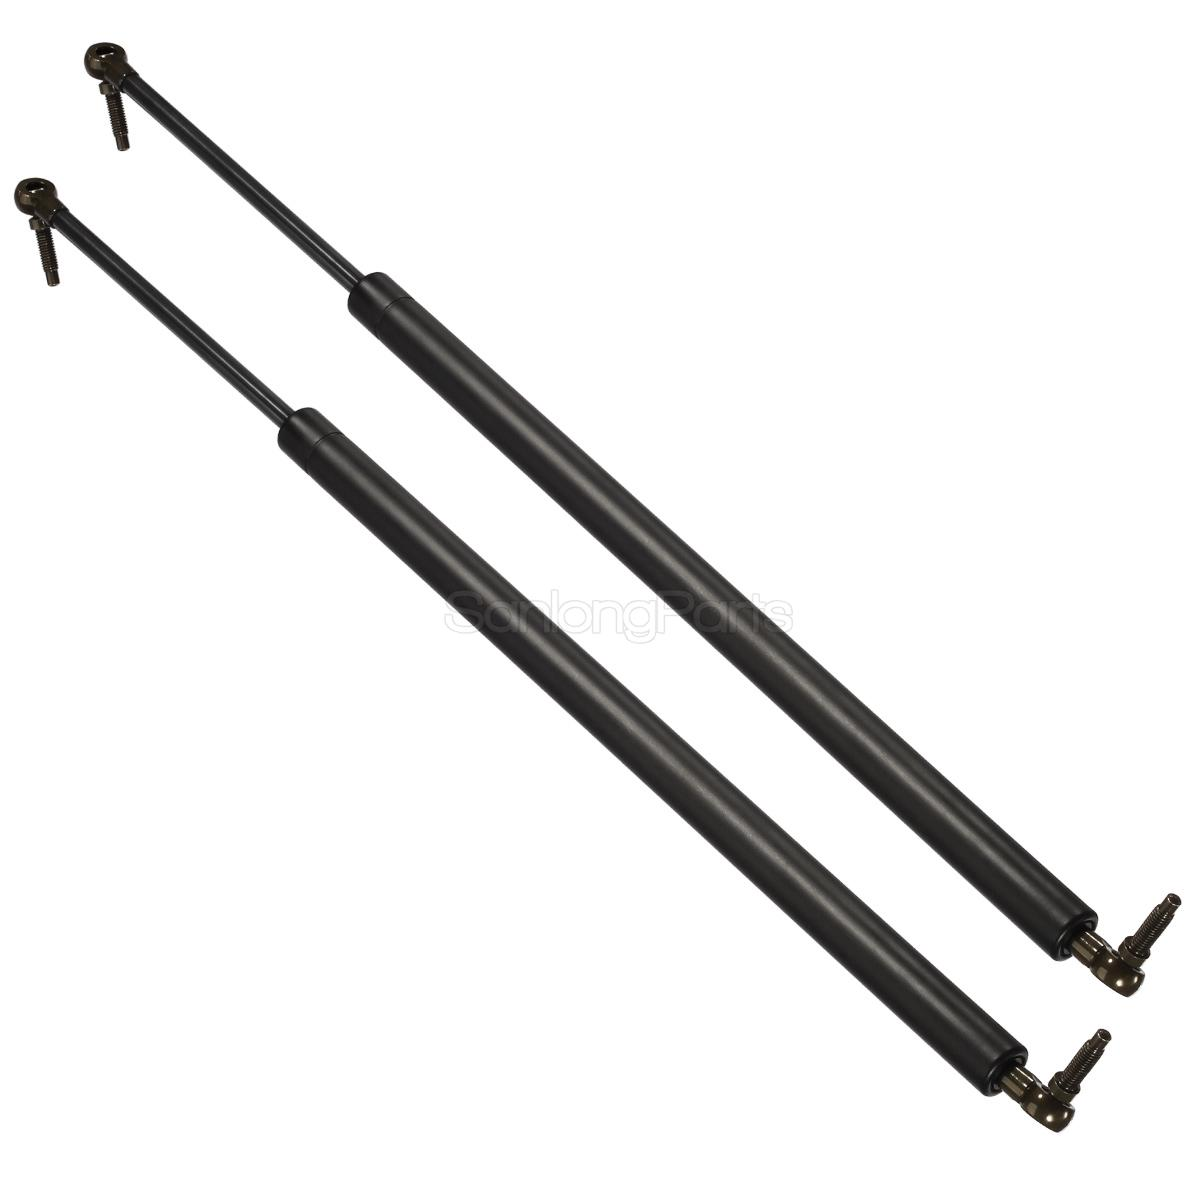 2PCS Rear Liftgate Gas Tailgate Hatch Lift Supports Struts